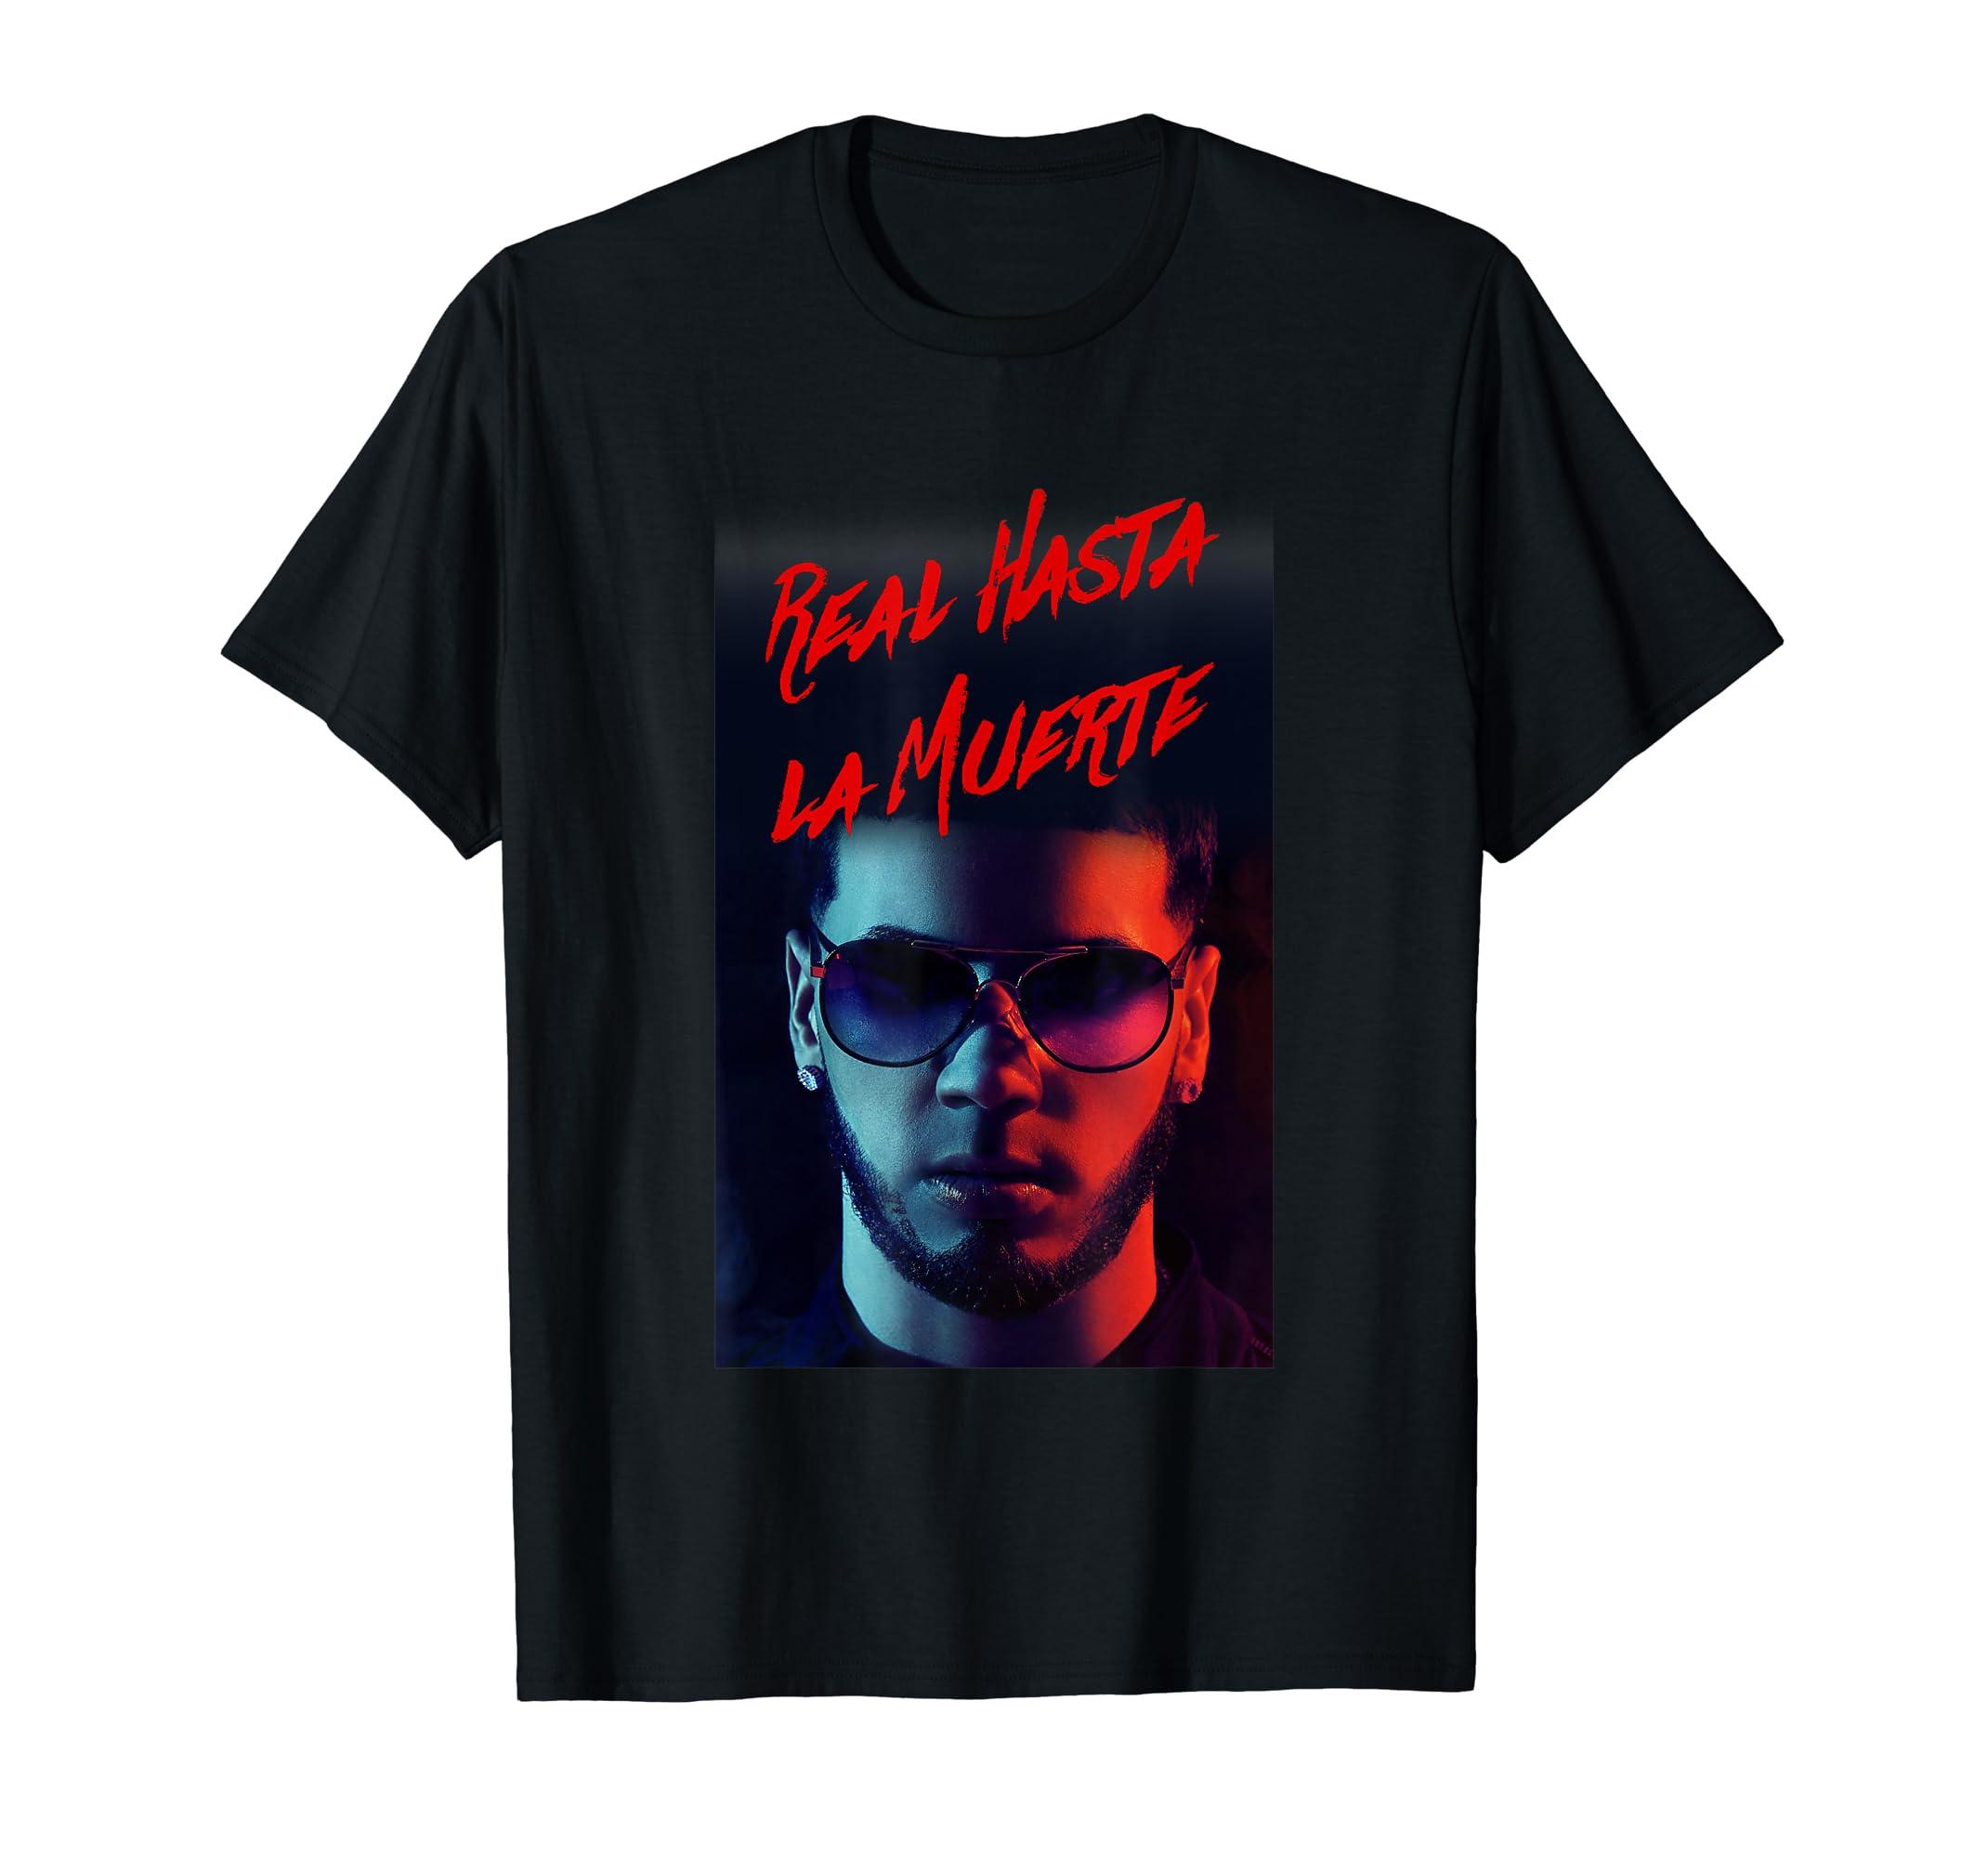 d7cf5af812443 Amazon.com  Real hasta la muerte T-Shirt  Clothing